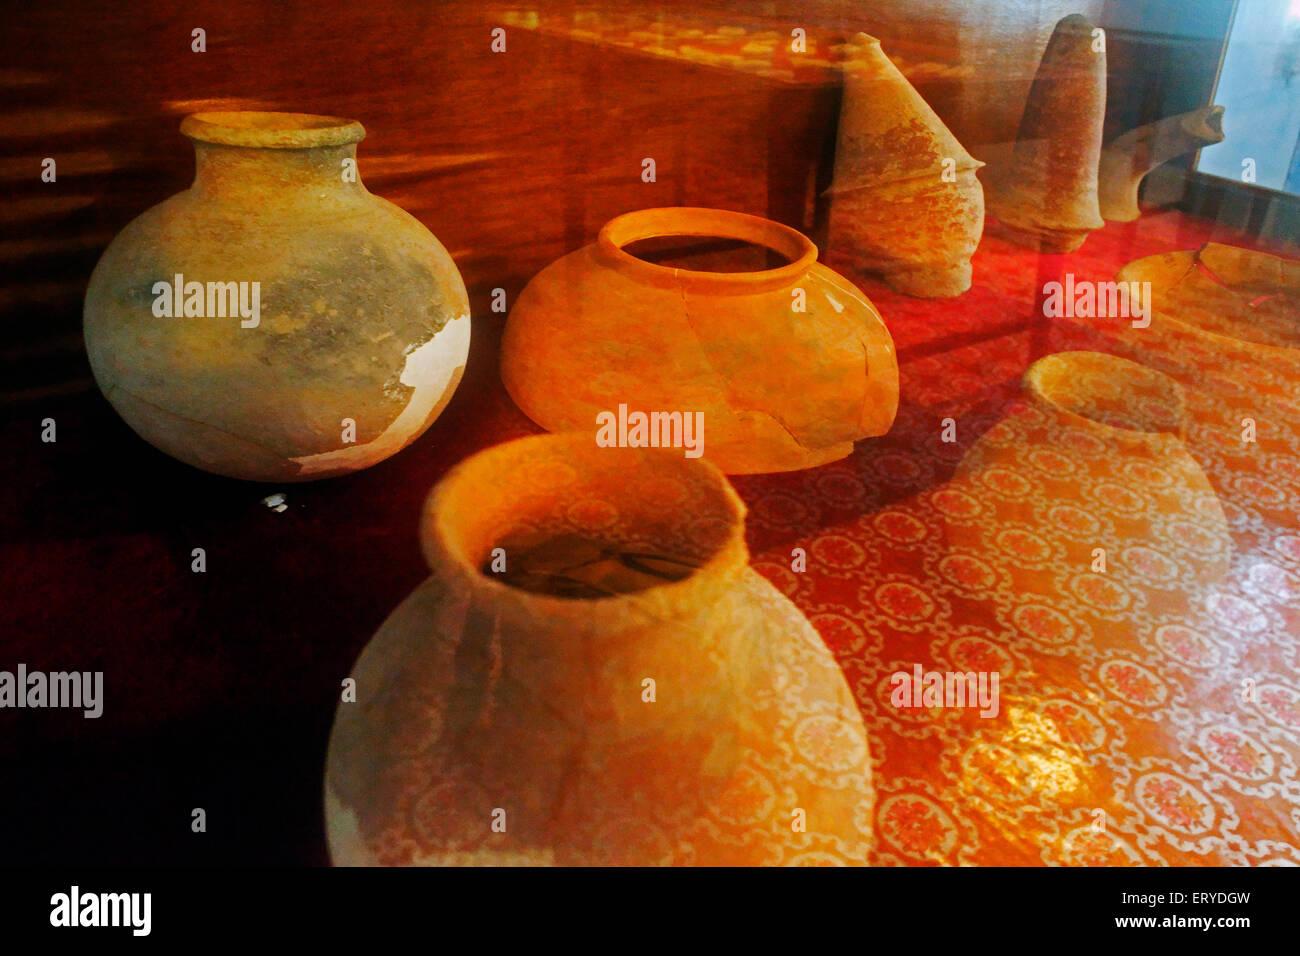 Excavated artefact in museum ; UNESCO World Heritage Gautam Buddha's birthplace ; Lumbini ; Nepal - Stock Image